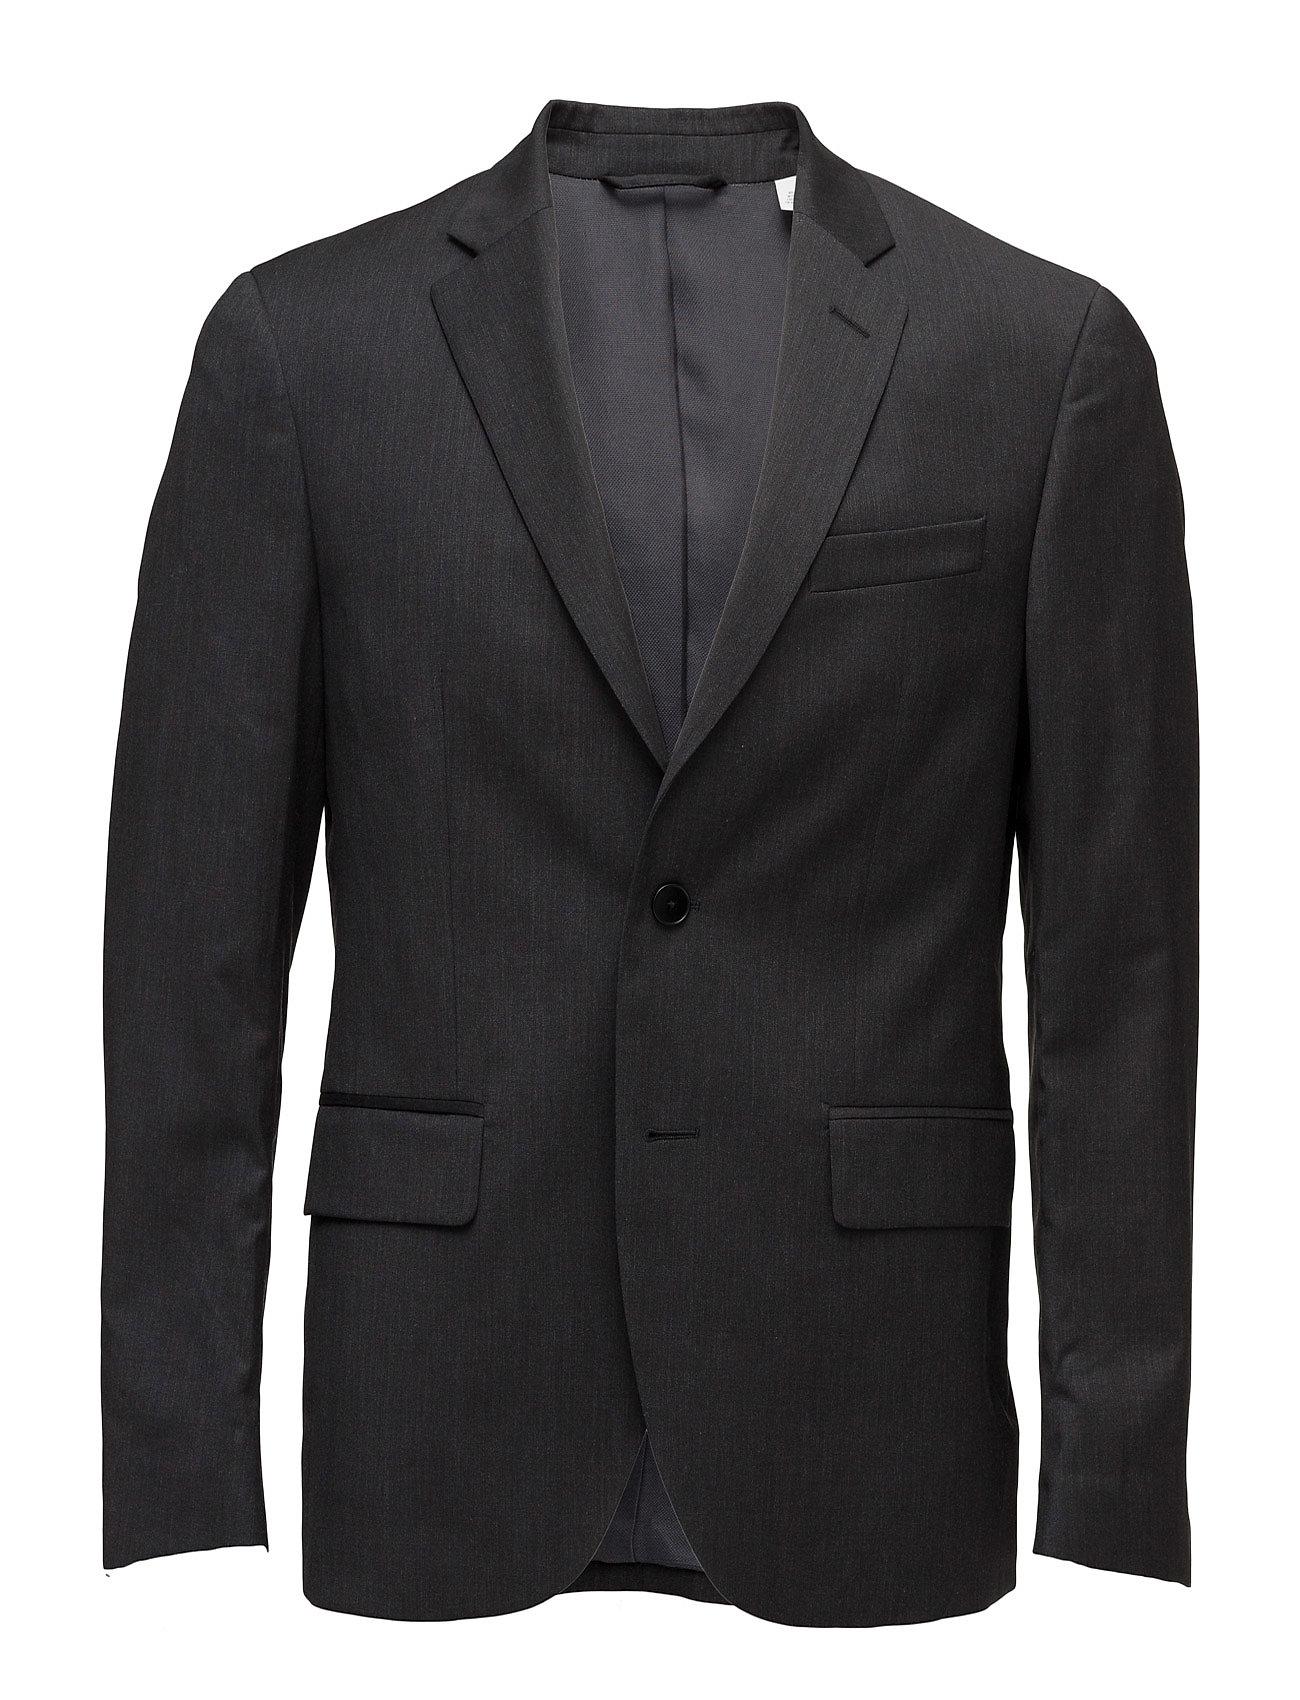 G. Travel Suit Jacket GANT Blazere til Herrer i Marine blå